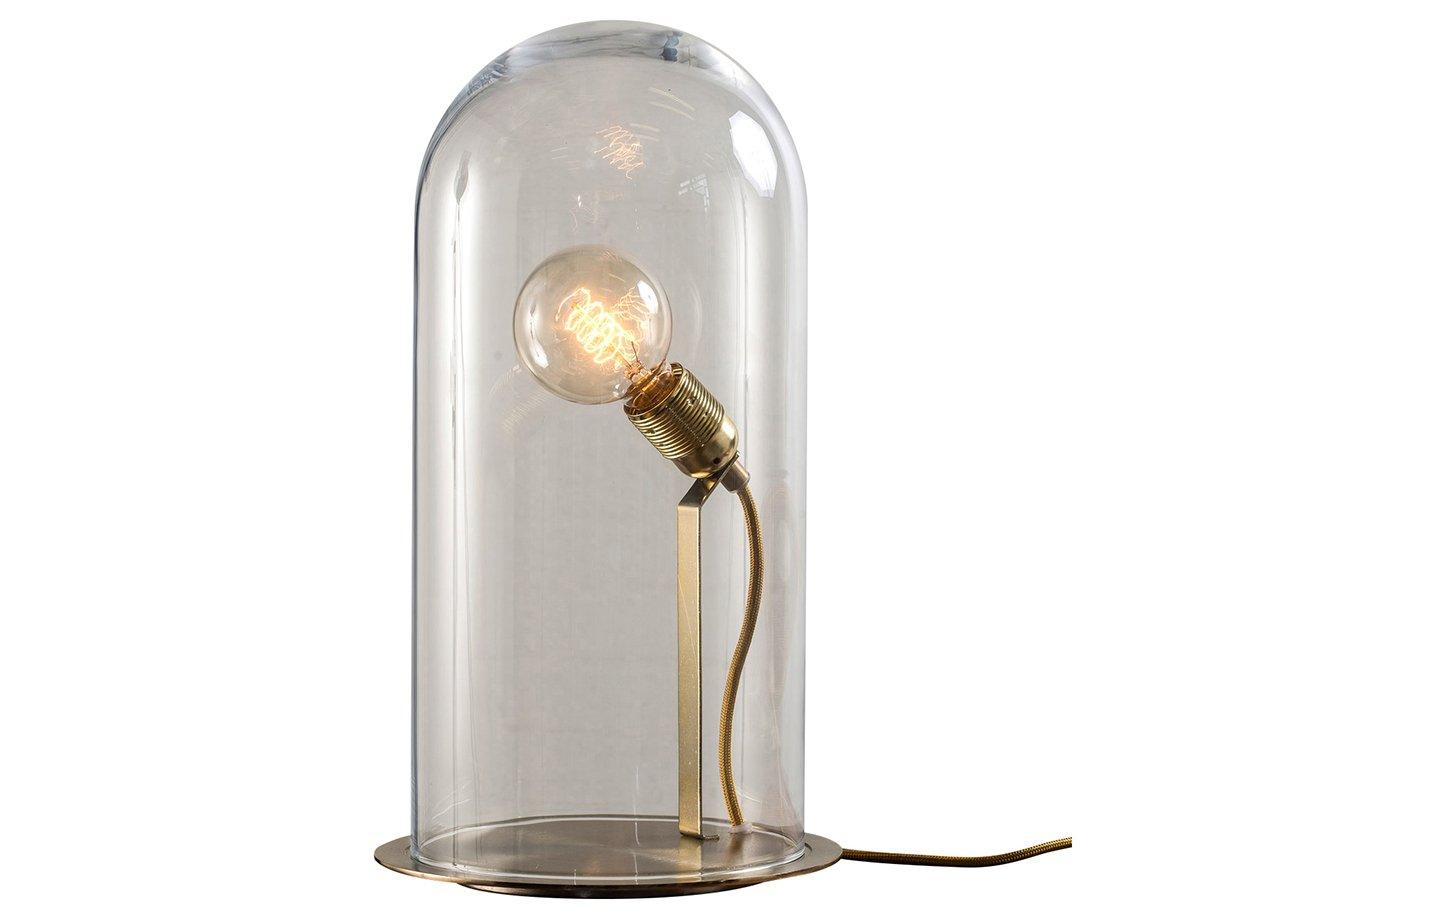 speak up table lamp – Chestnut-brown